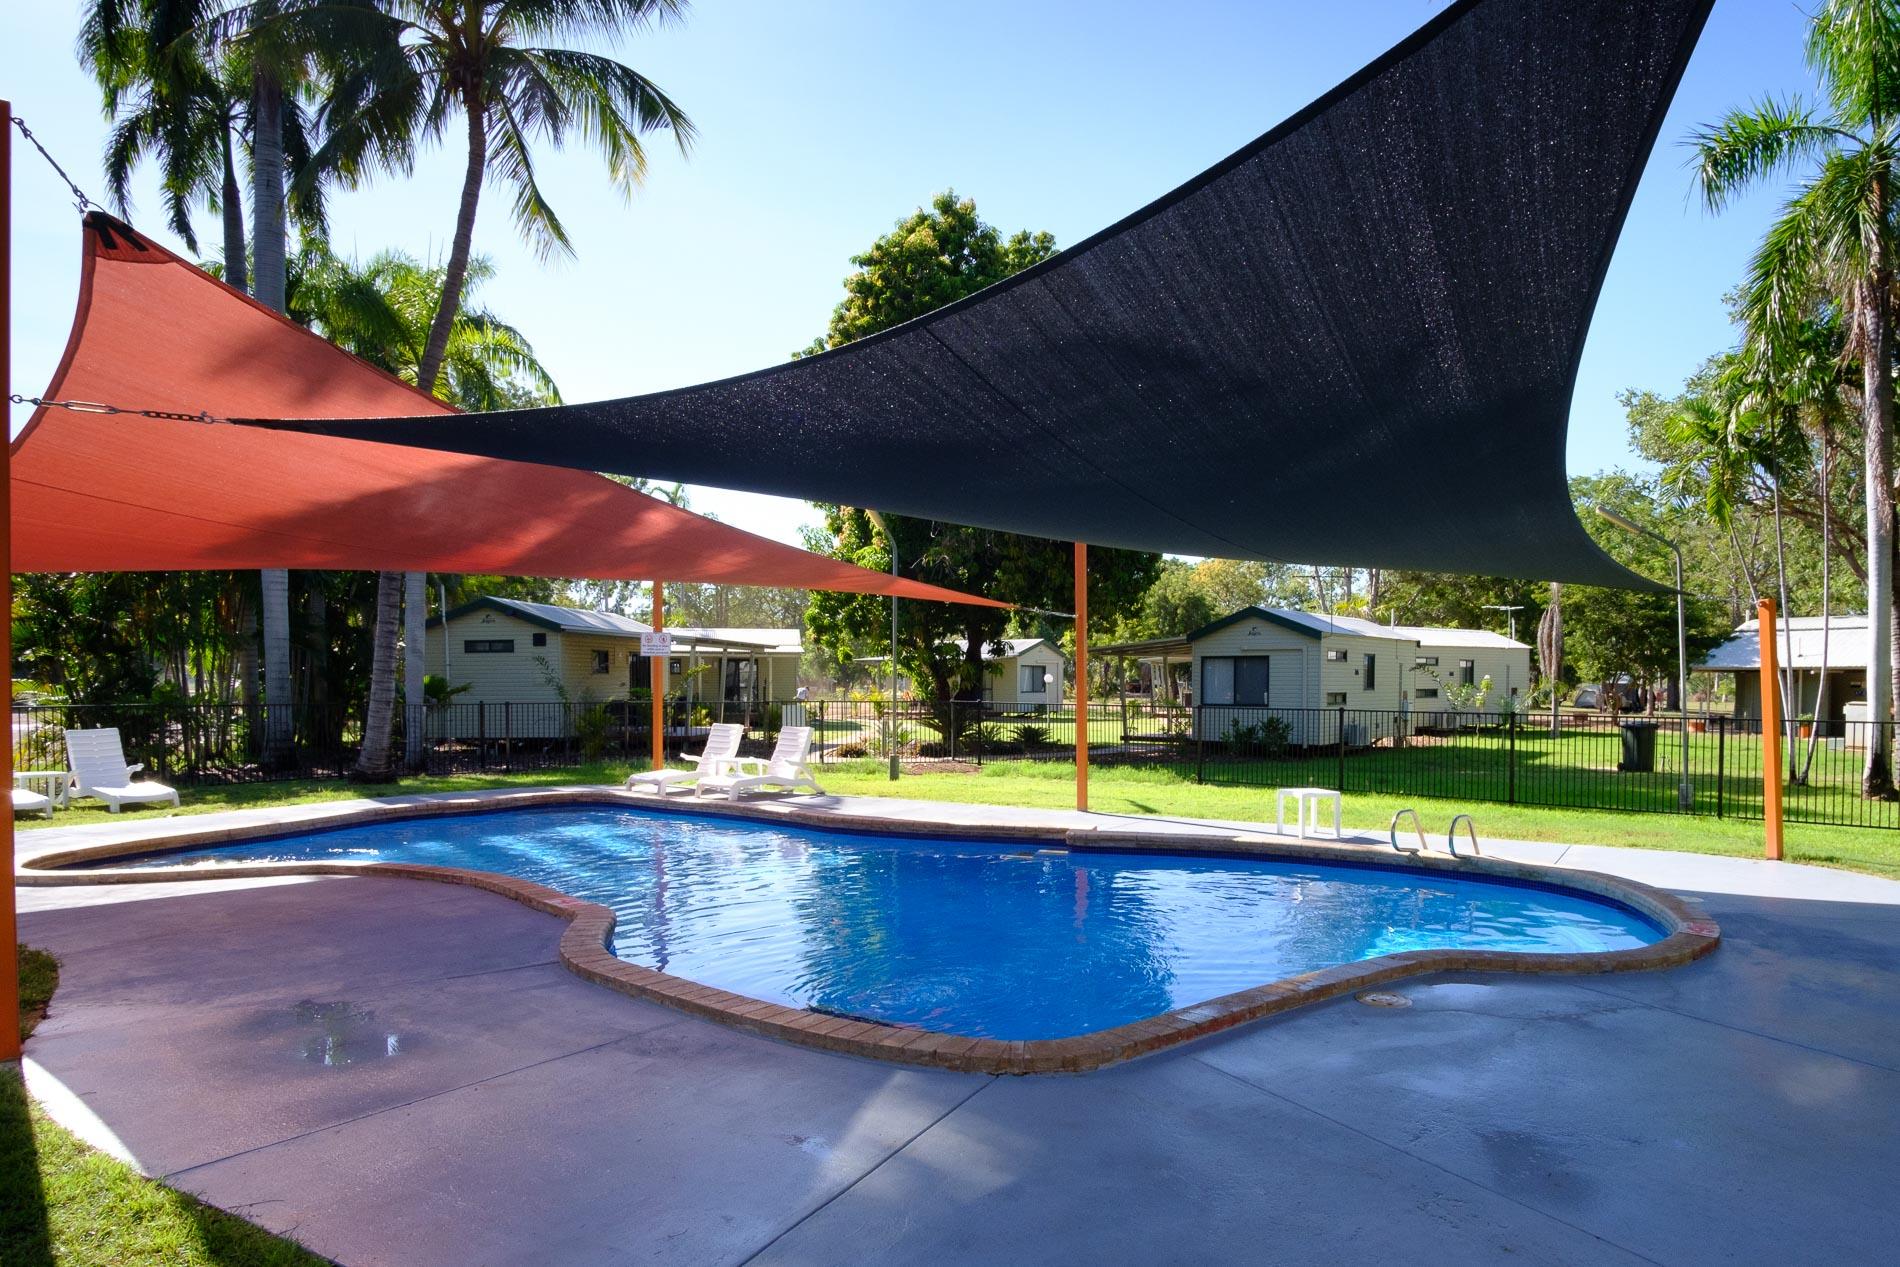 Poolside Swimming Pool at Kimberleyland Caravan Park